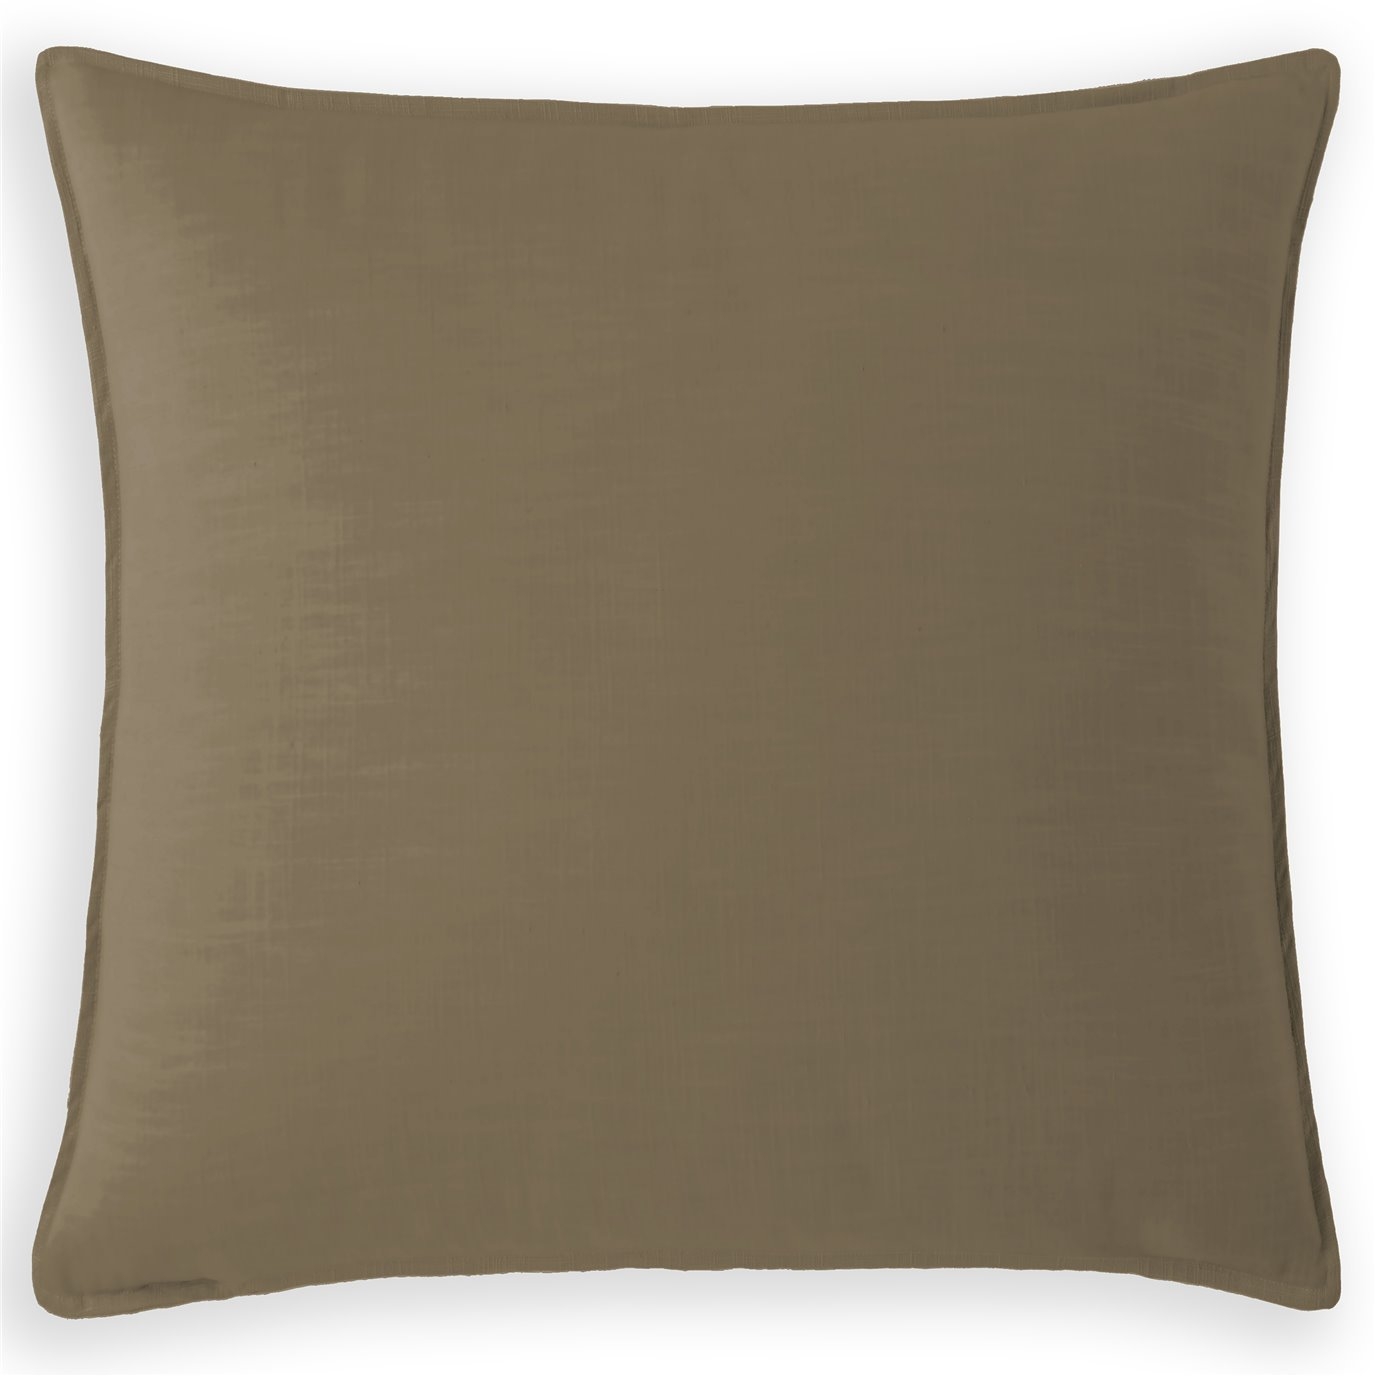 Elmwood Decorative Cushion - 20 Inch Square - Coordinating Velvet